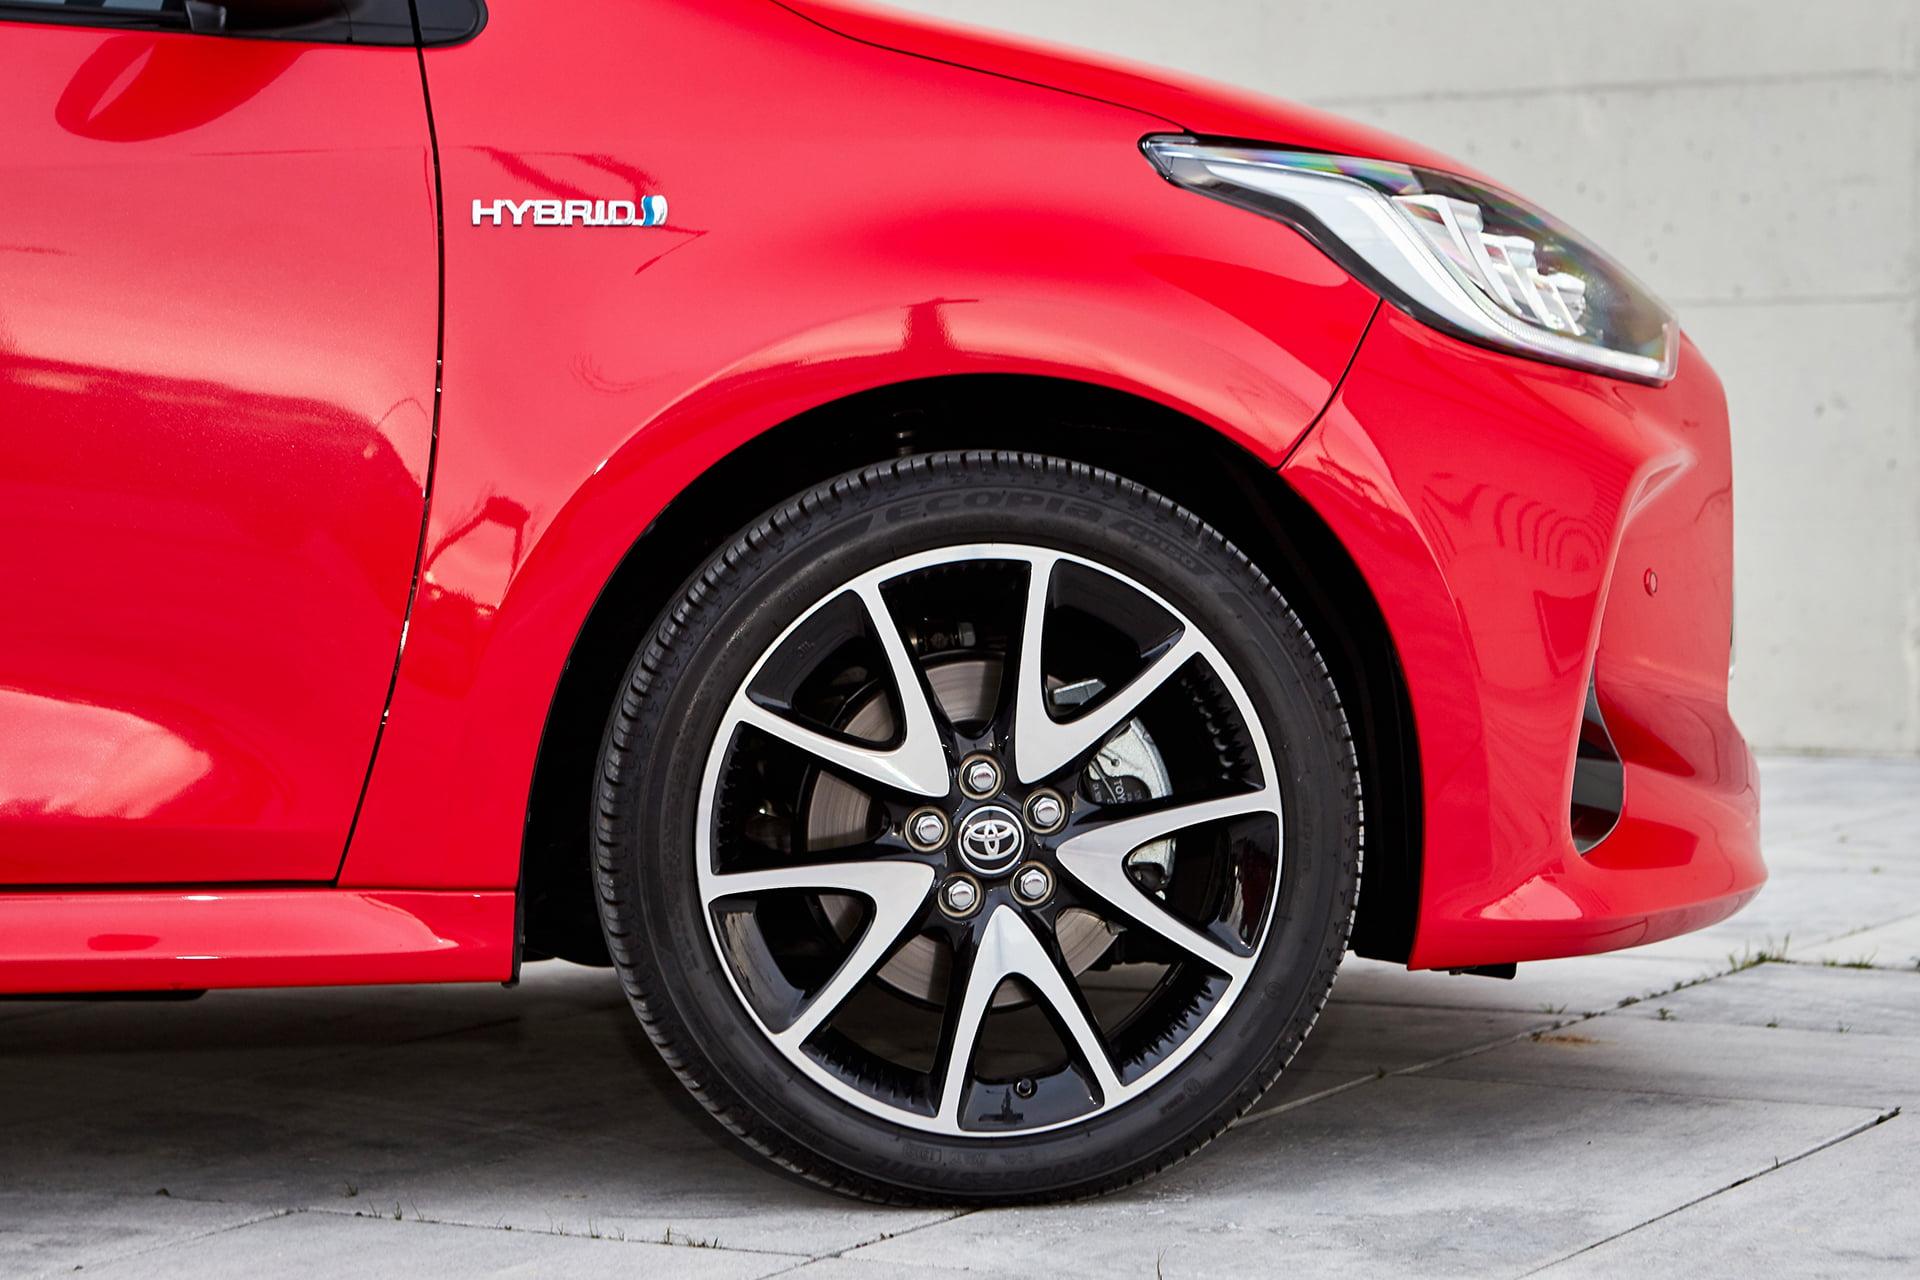 Yaris Electric Hybrid, ya disponible en reserva